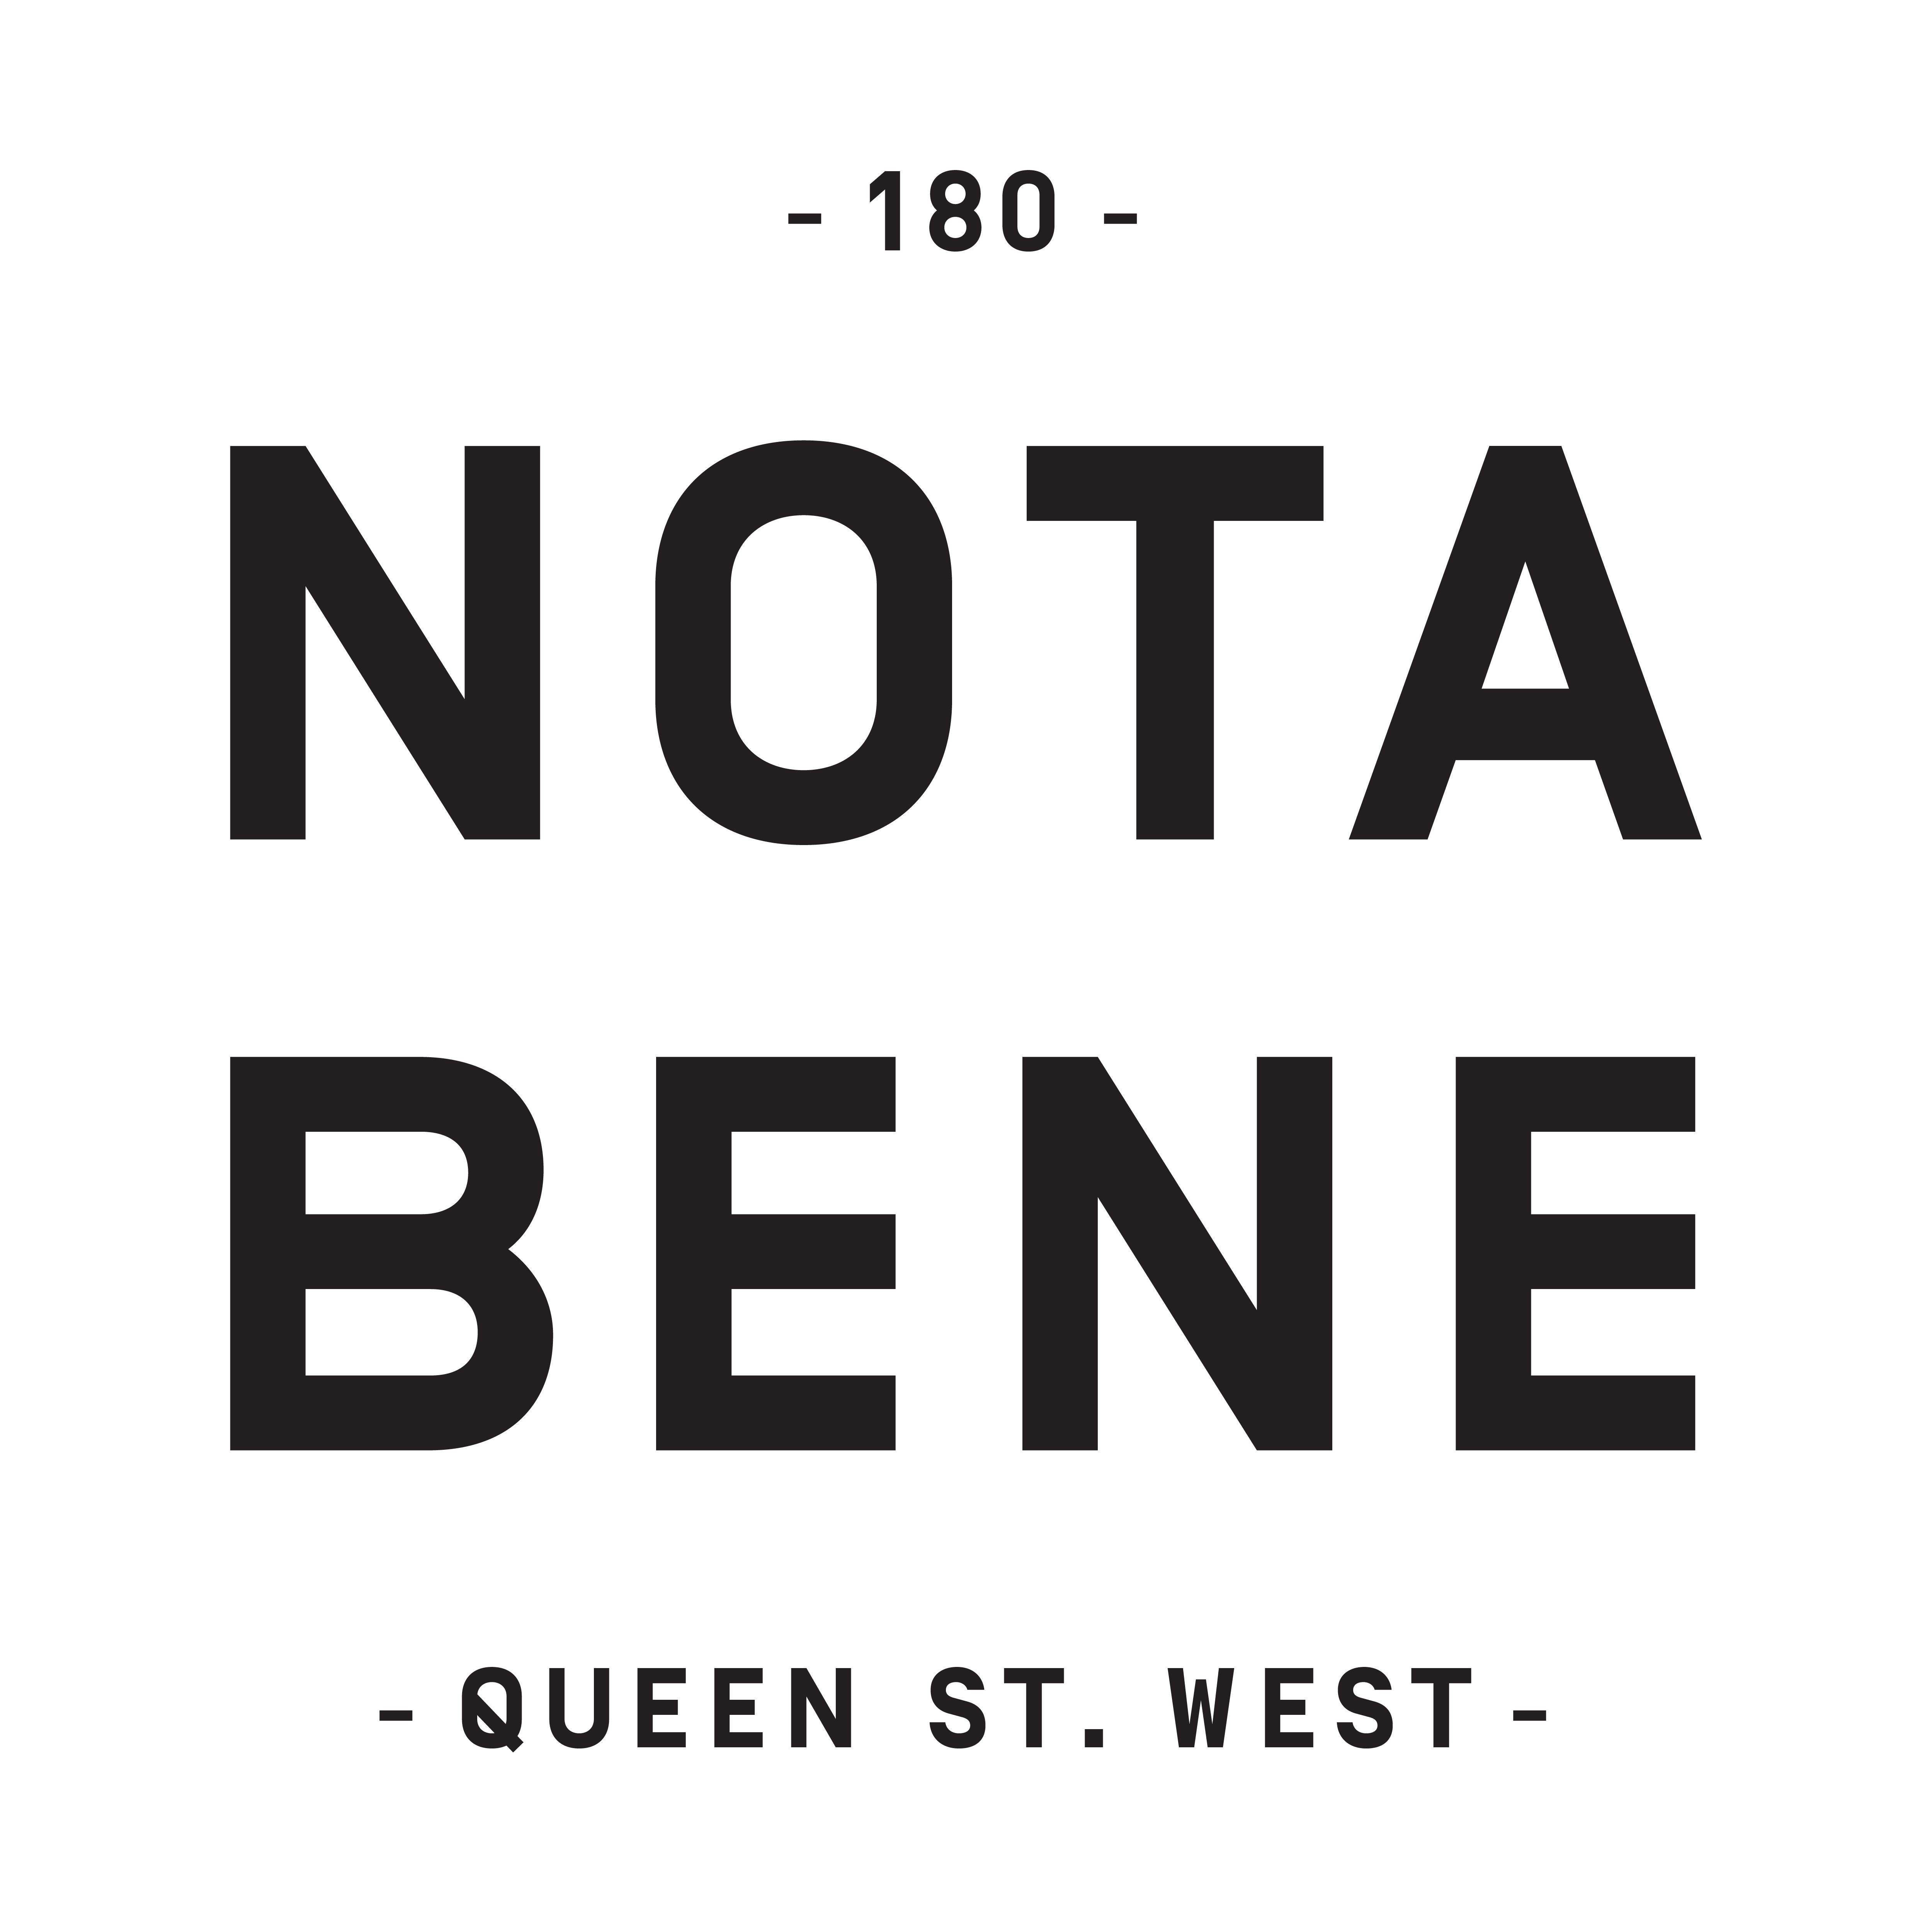 nota-bene-address-logo-high-res